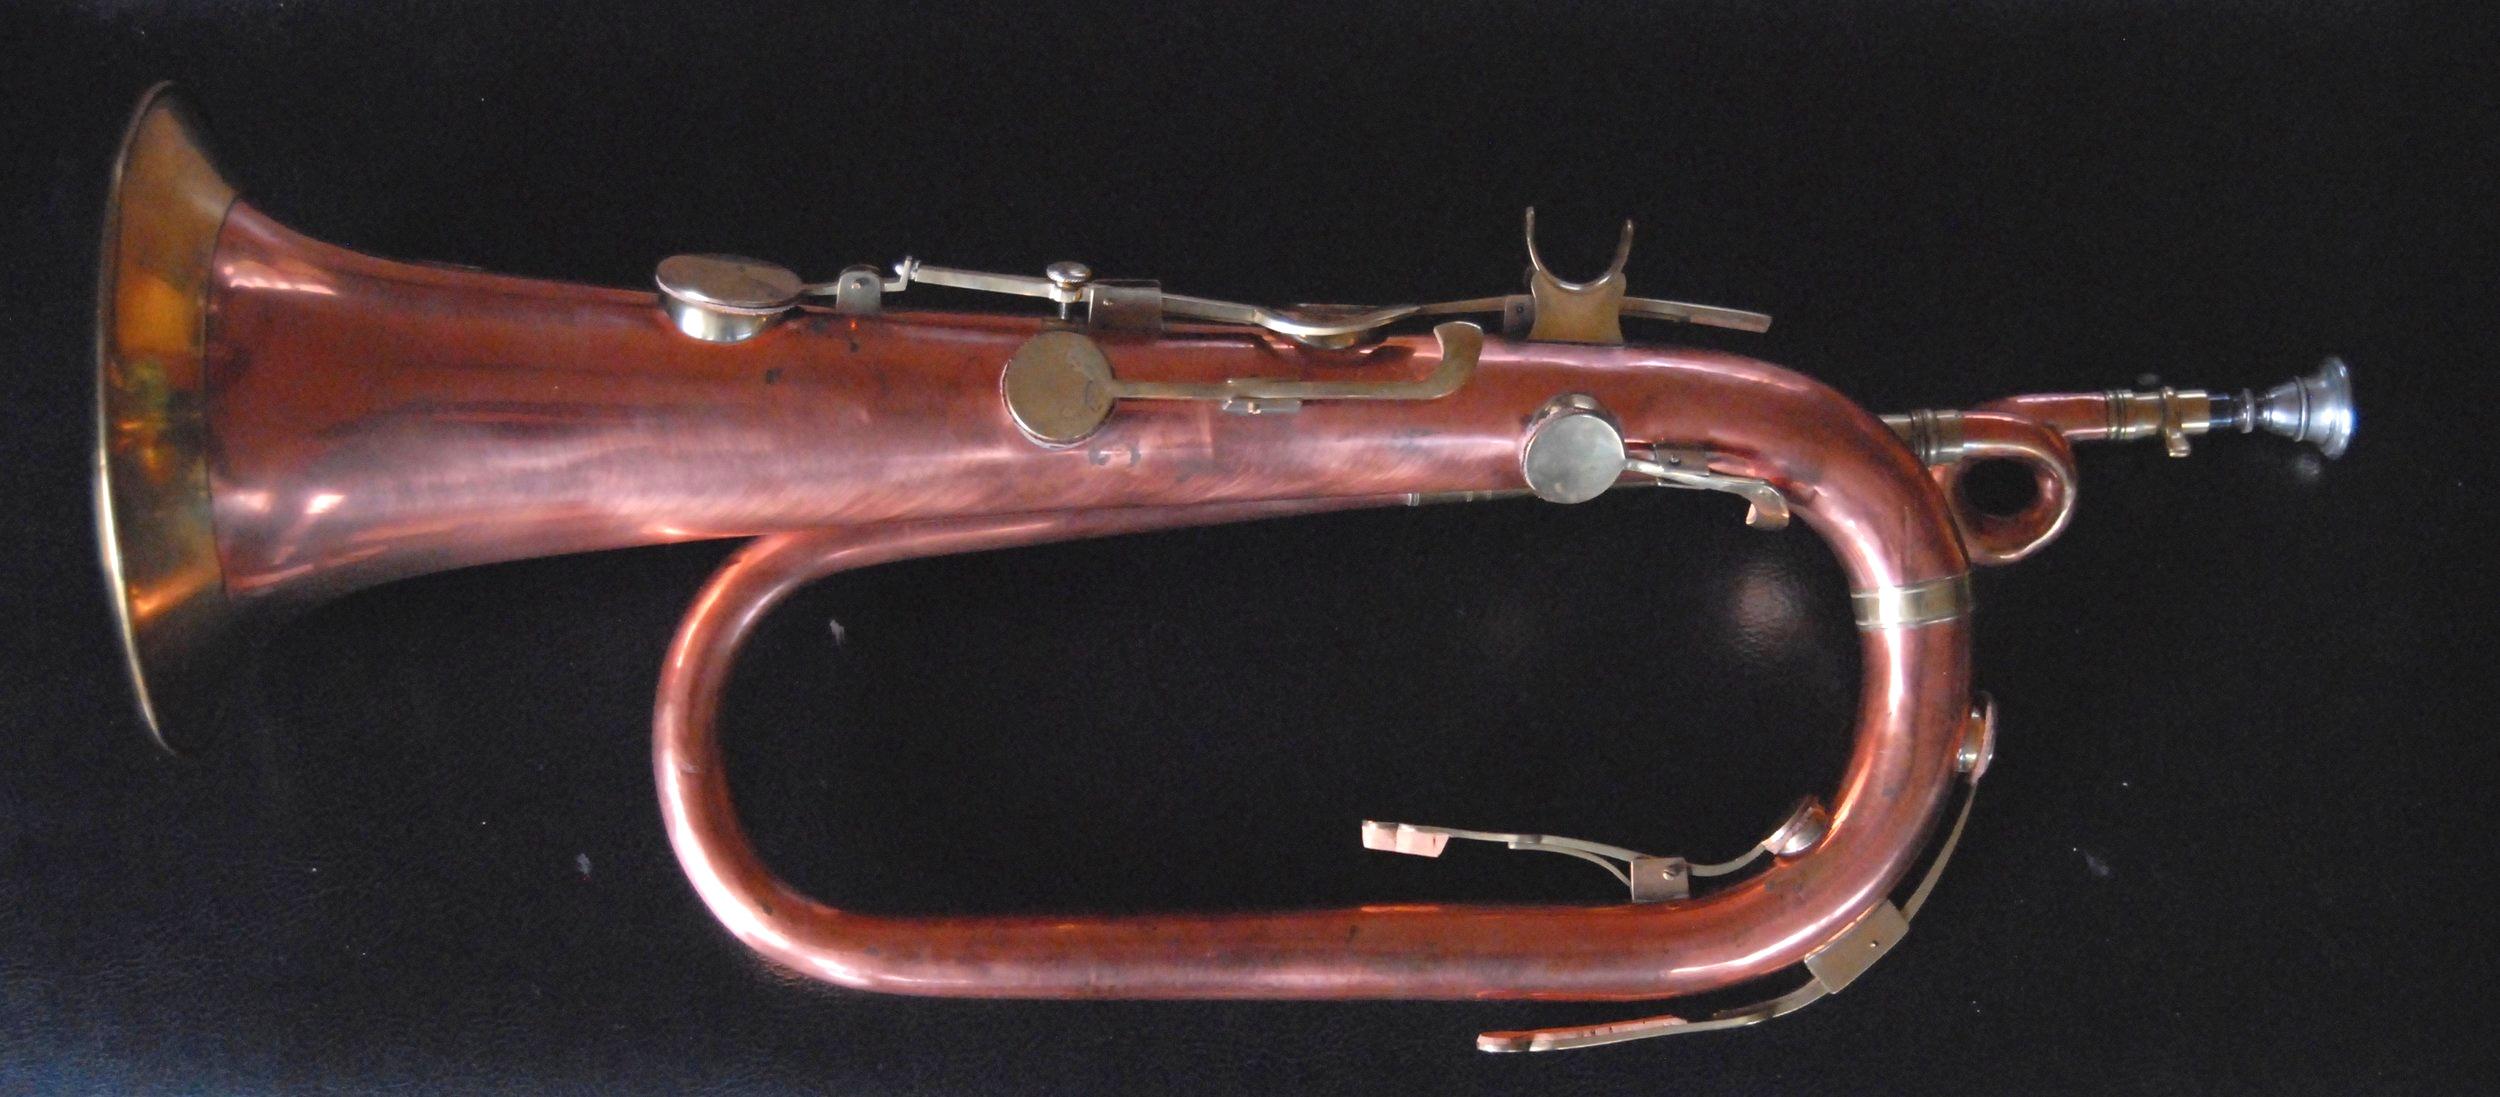 Christman six key Bb keyed bugle